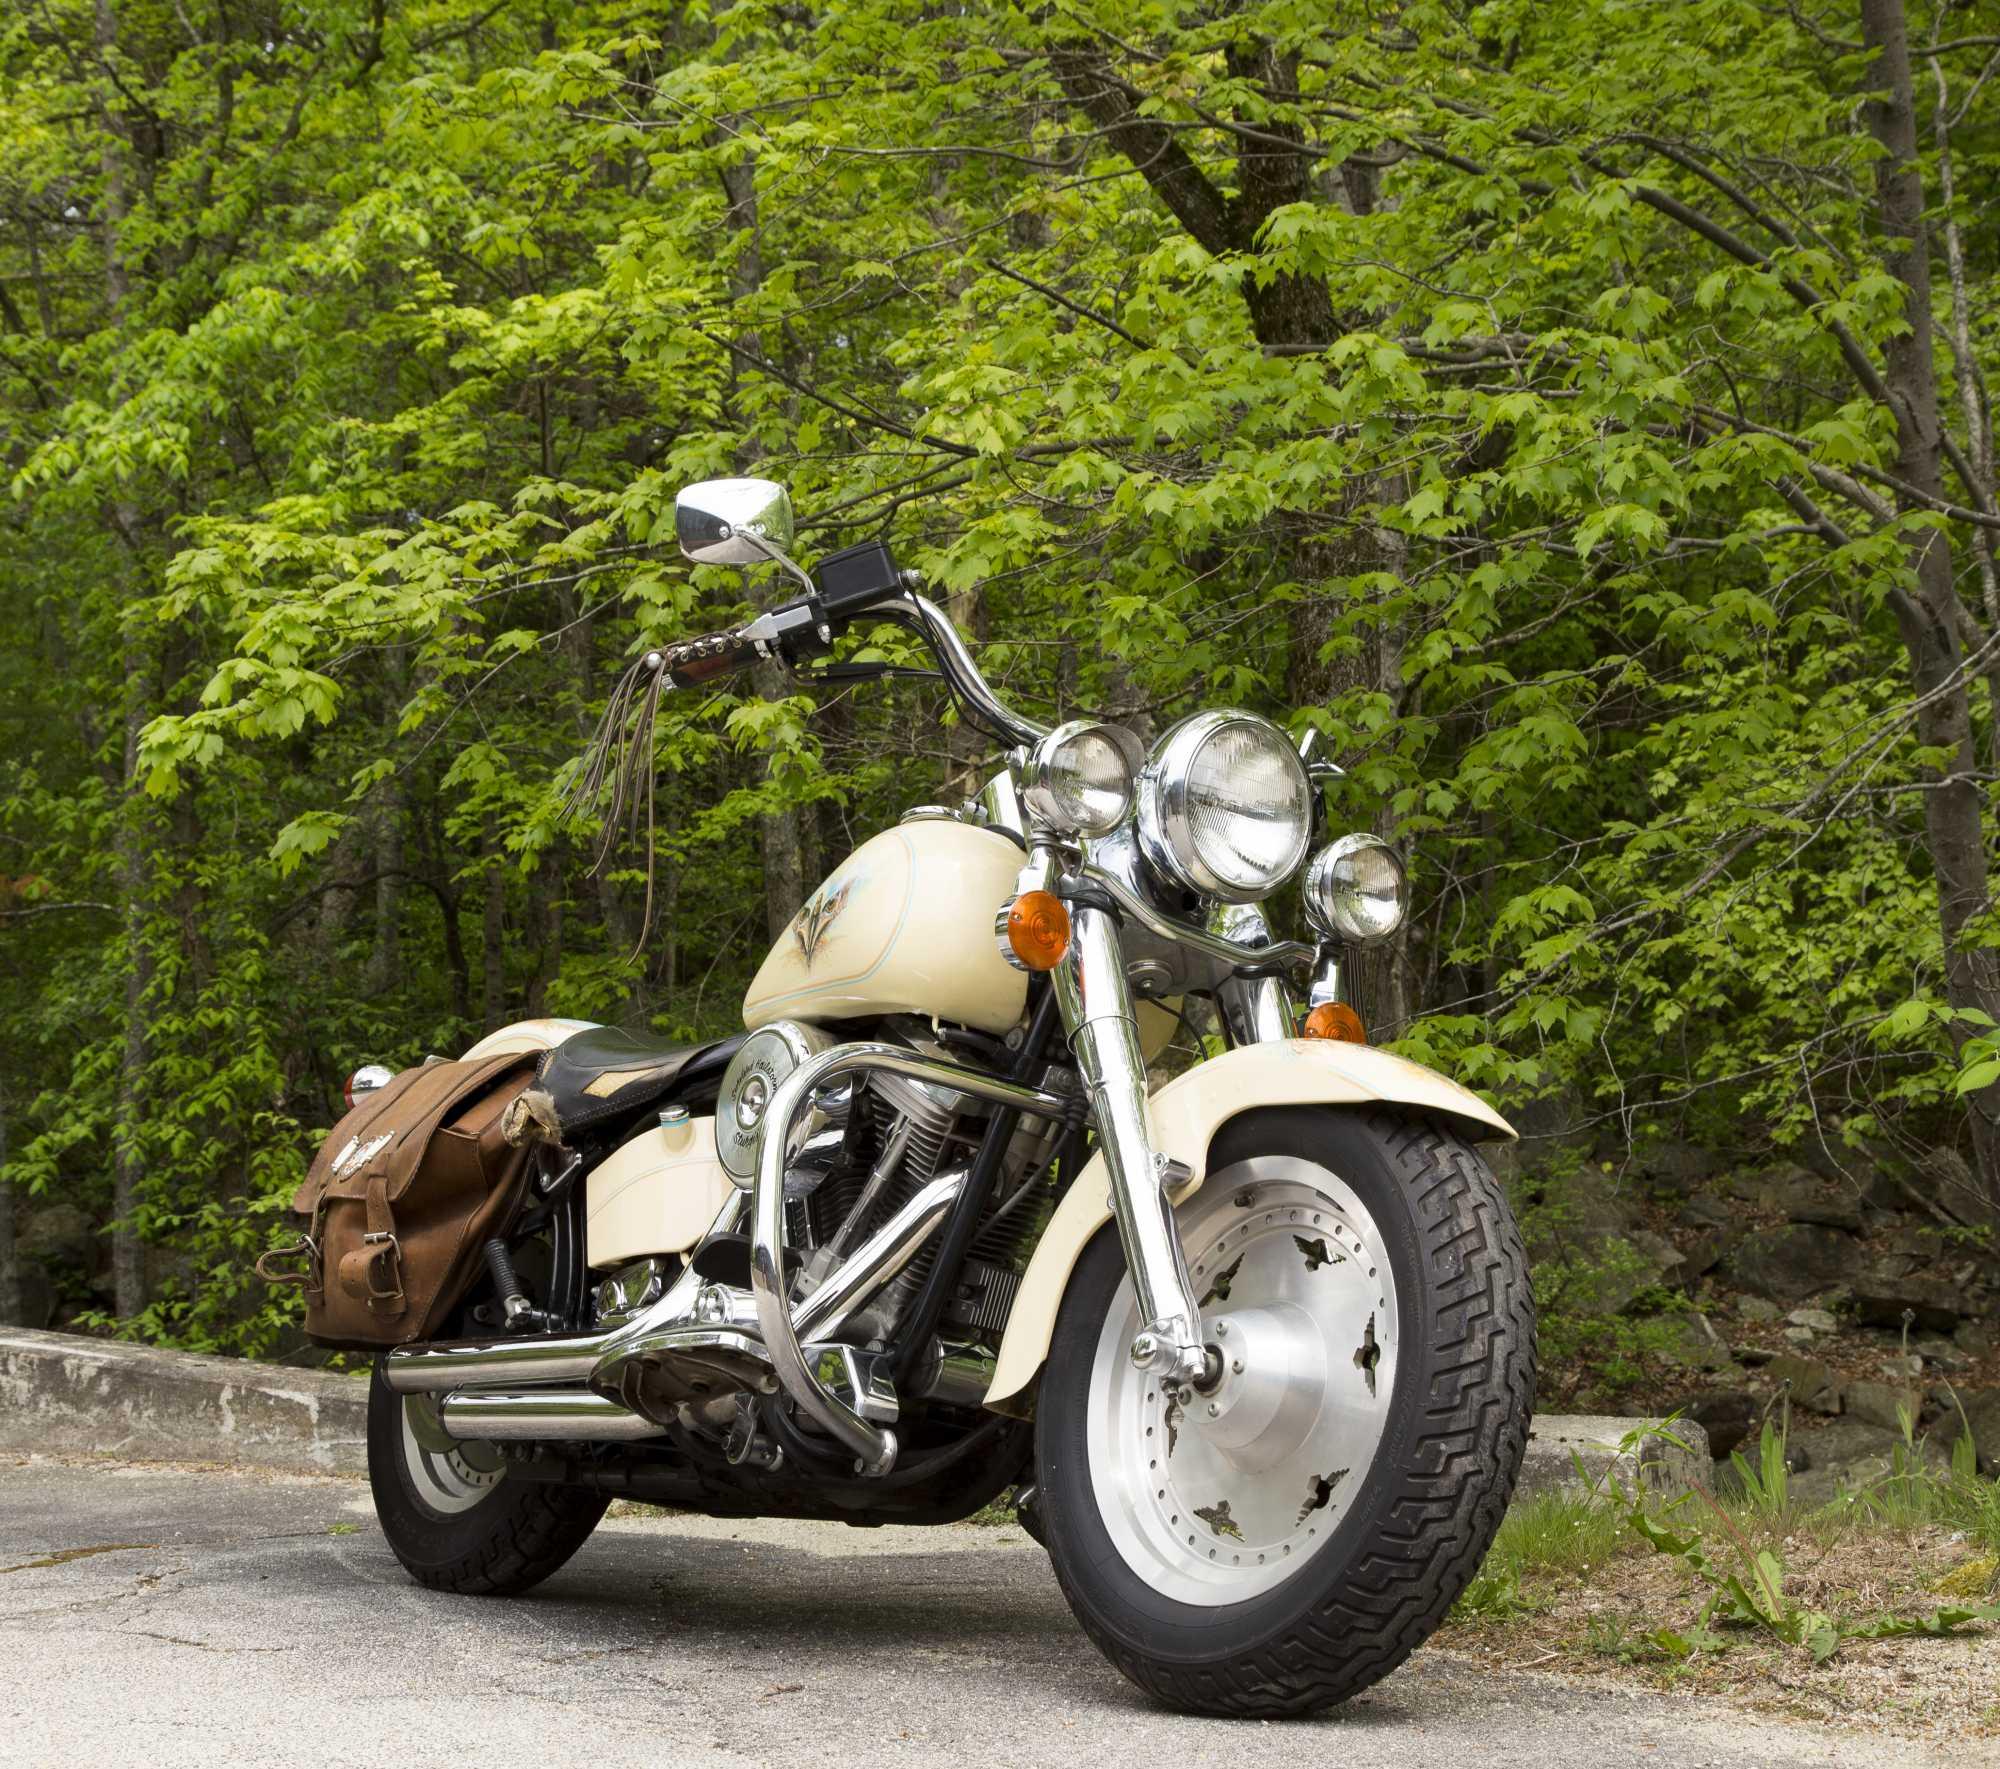 1990 Harley Davidson u0026quot;Fat Boyu0026quot; Motorcycle